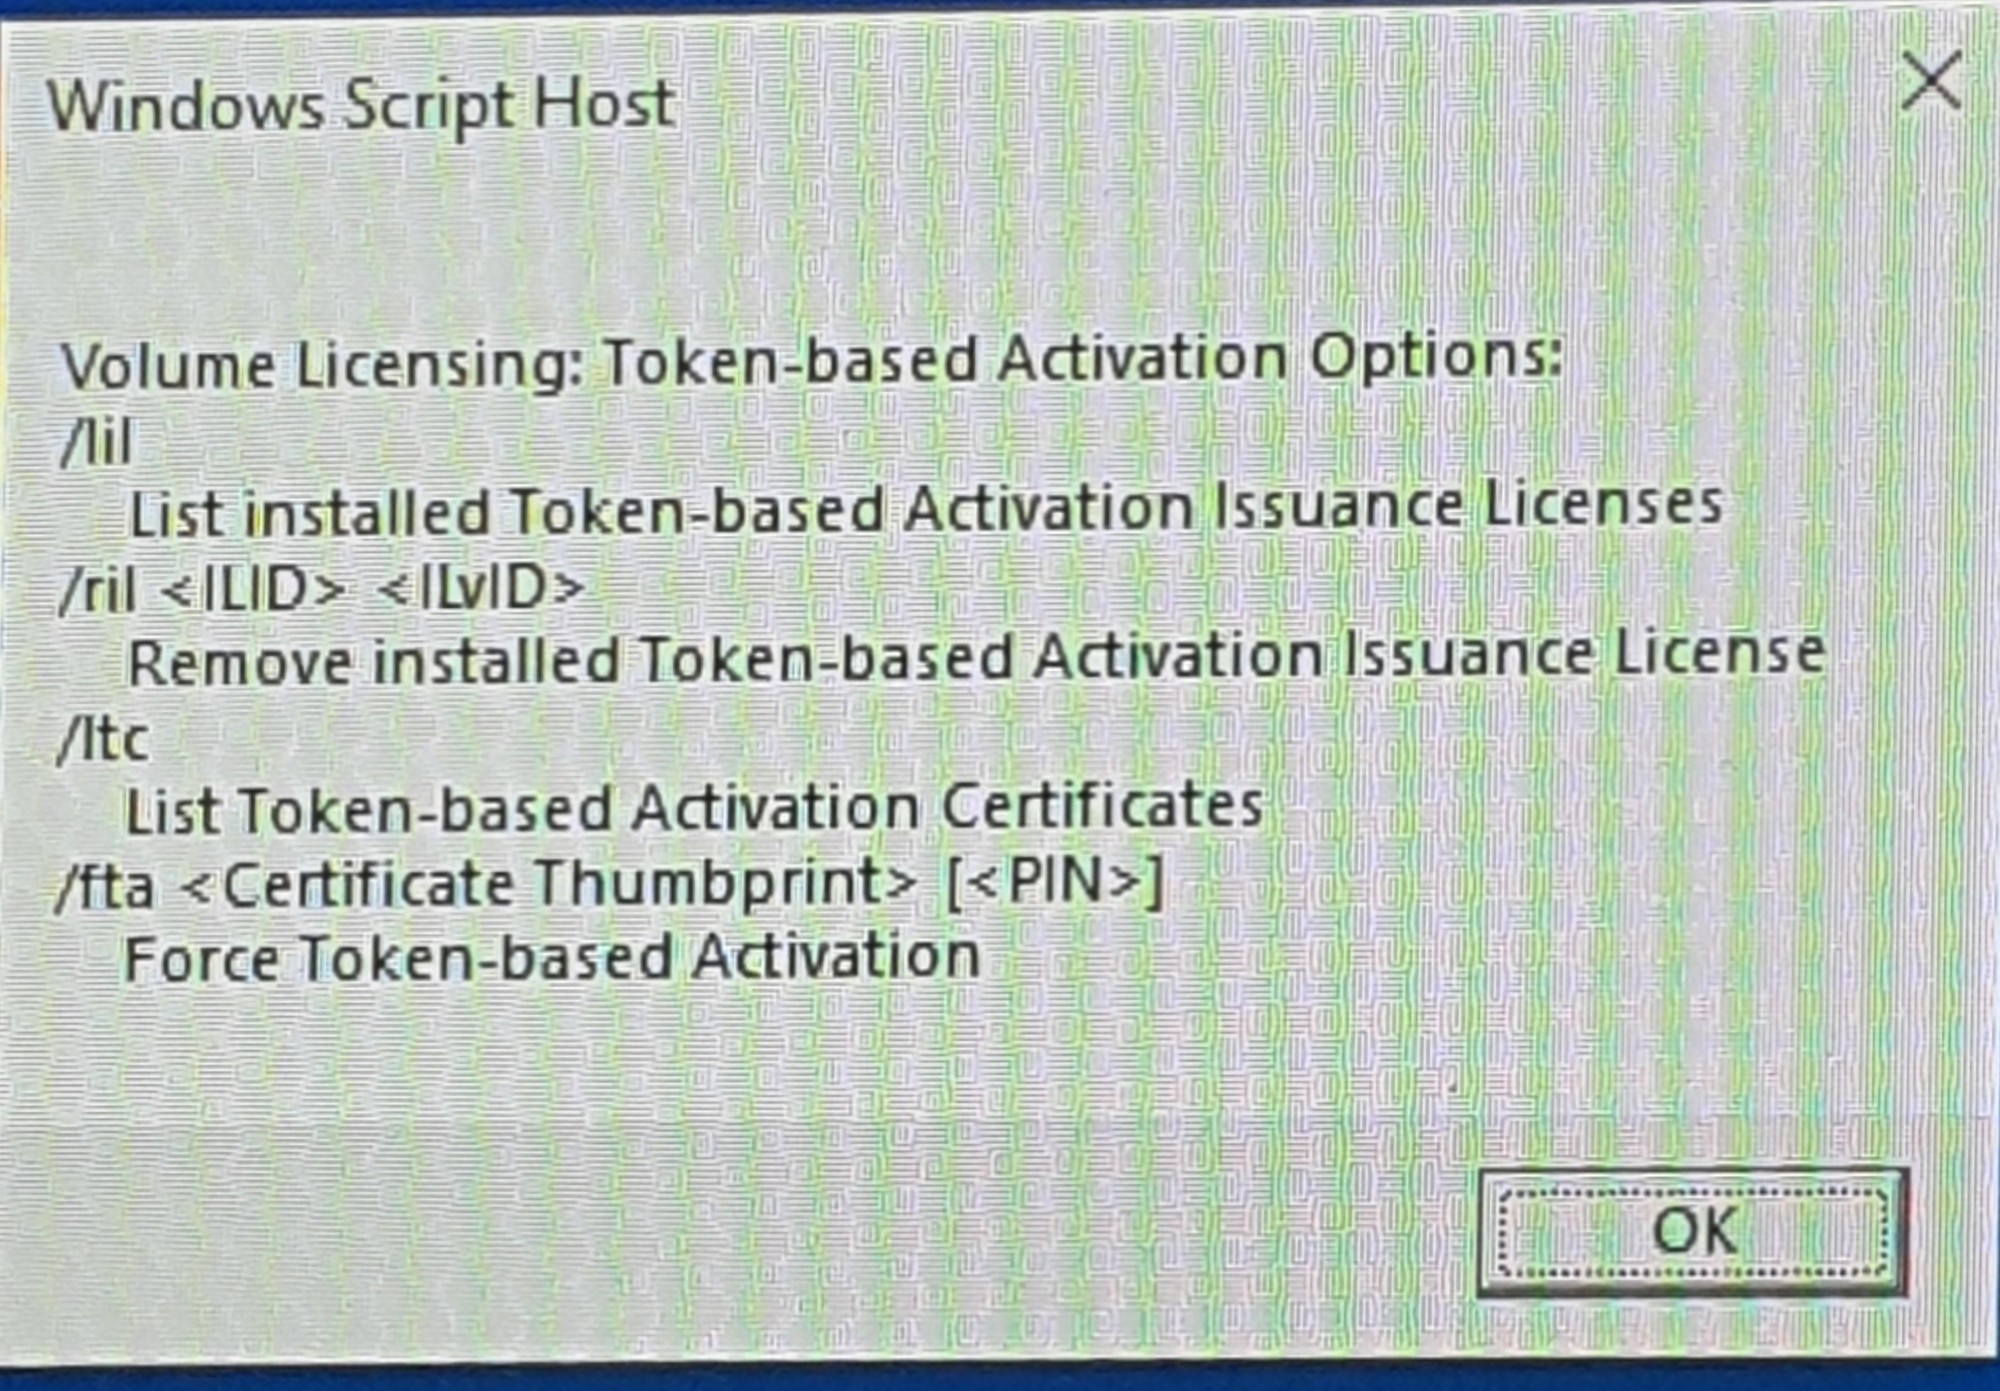 Venue 10 pro with a 0x803fa067 activation error  help!! 25a9f365-ec97-4bde-a668-15f9febb27ae?upload=true.jpg